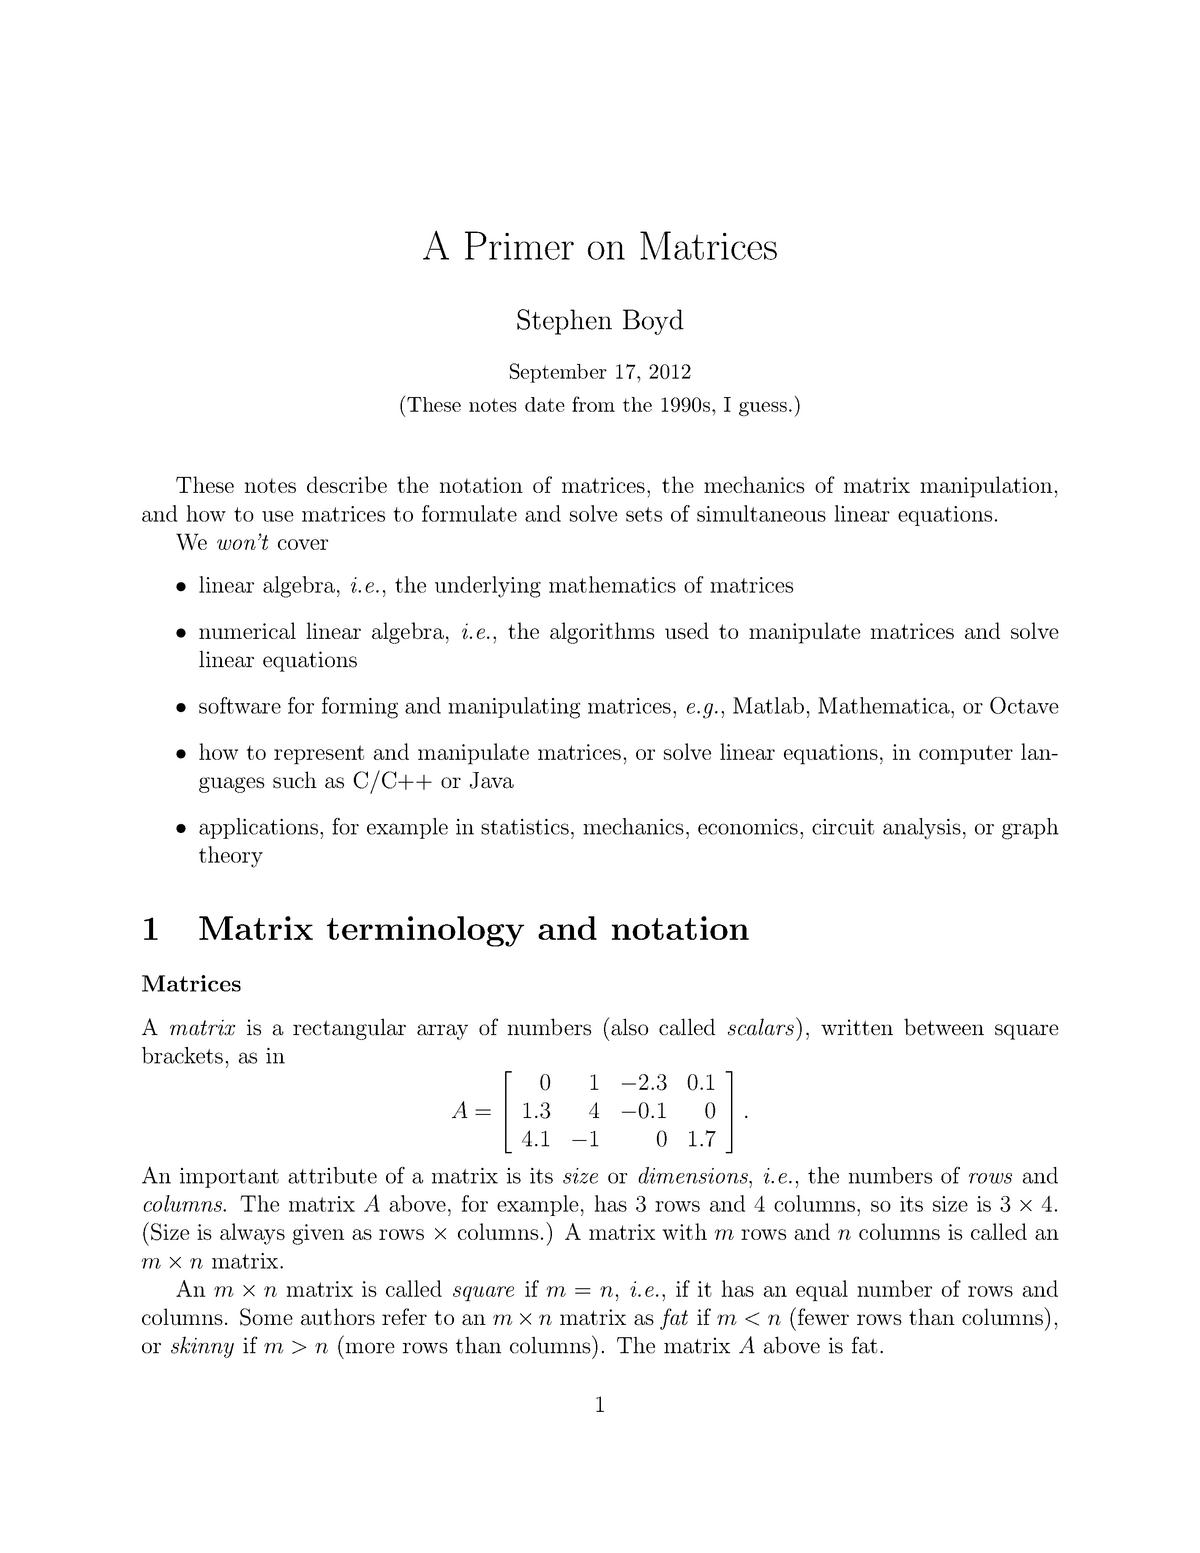 Practical - A primer on matrices - CS 168: The Modern Algorithmic